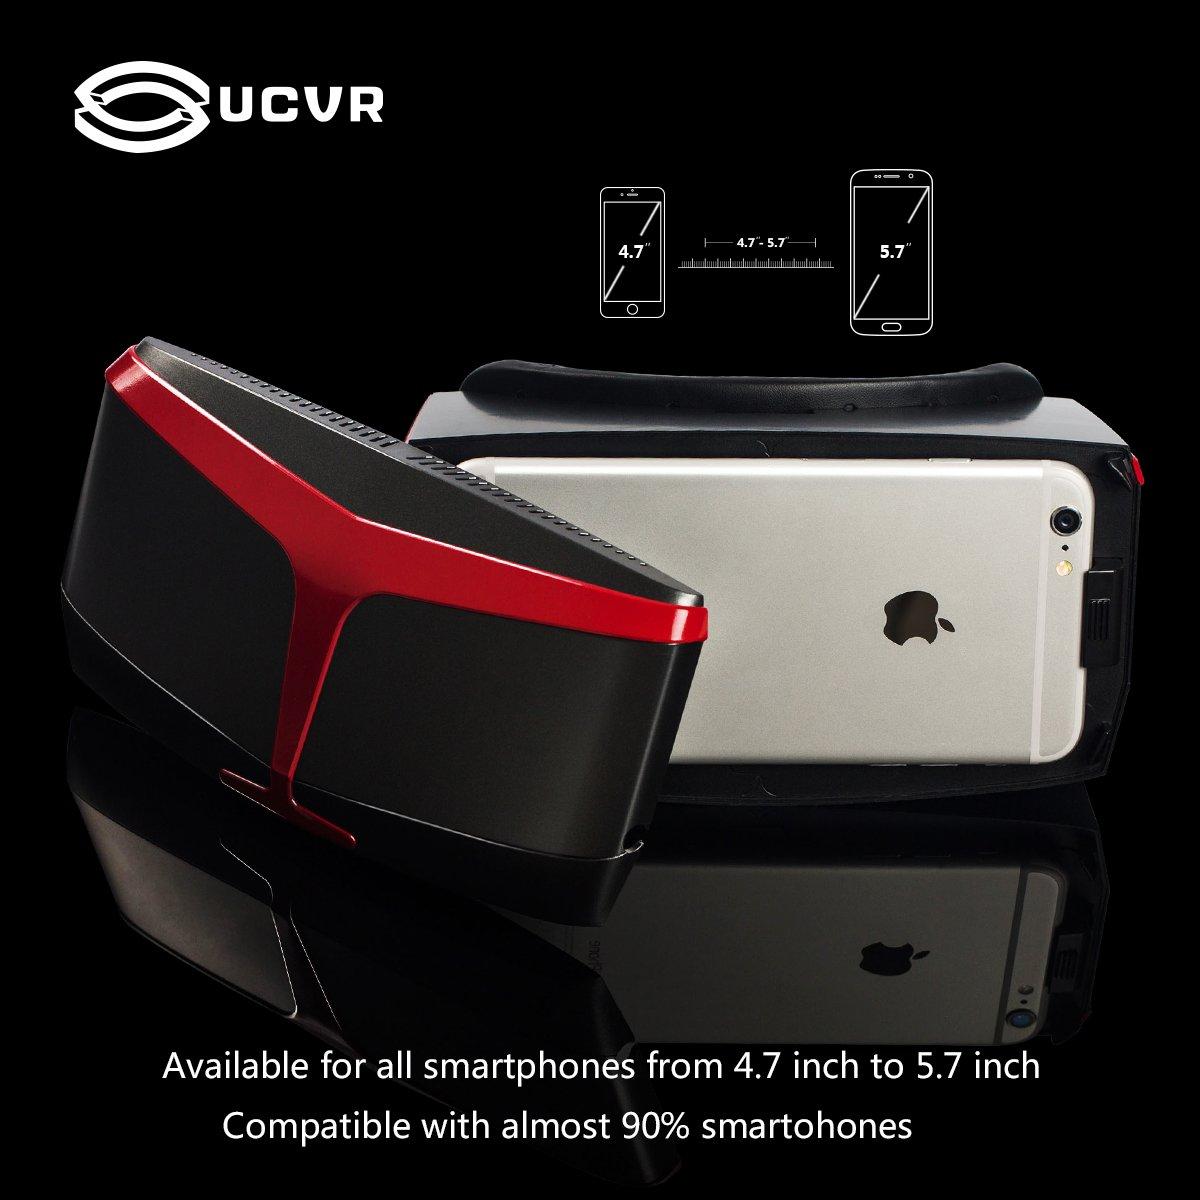 Ucvr 3d Vr Glasses Virtual Reality Headset Goggles Box Hedsset Samsung Kw Electronics